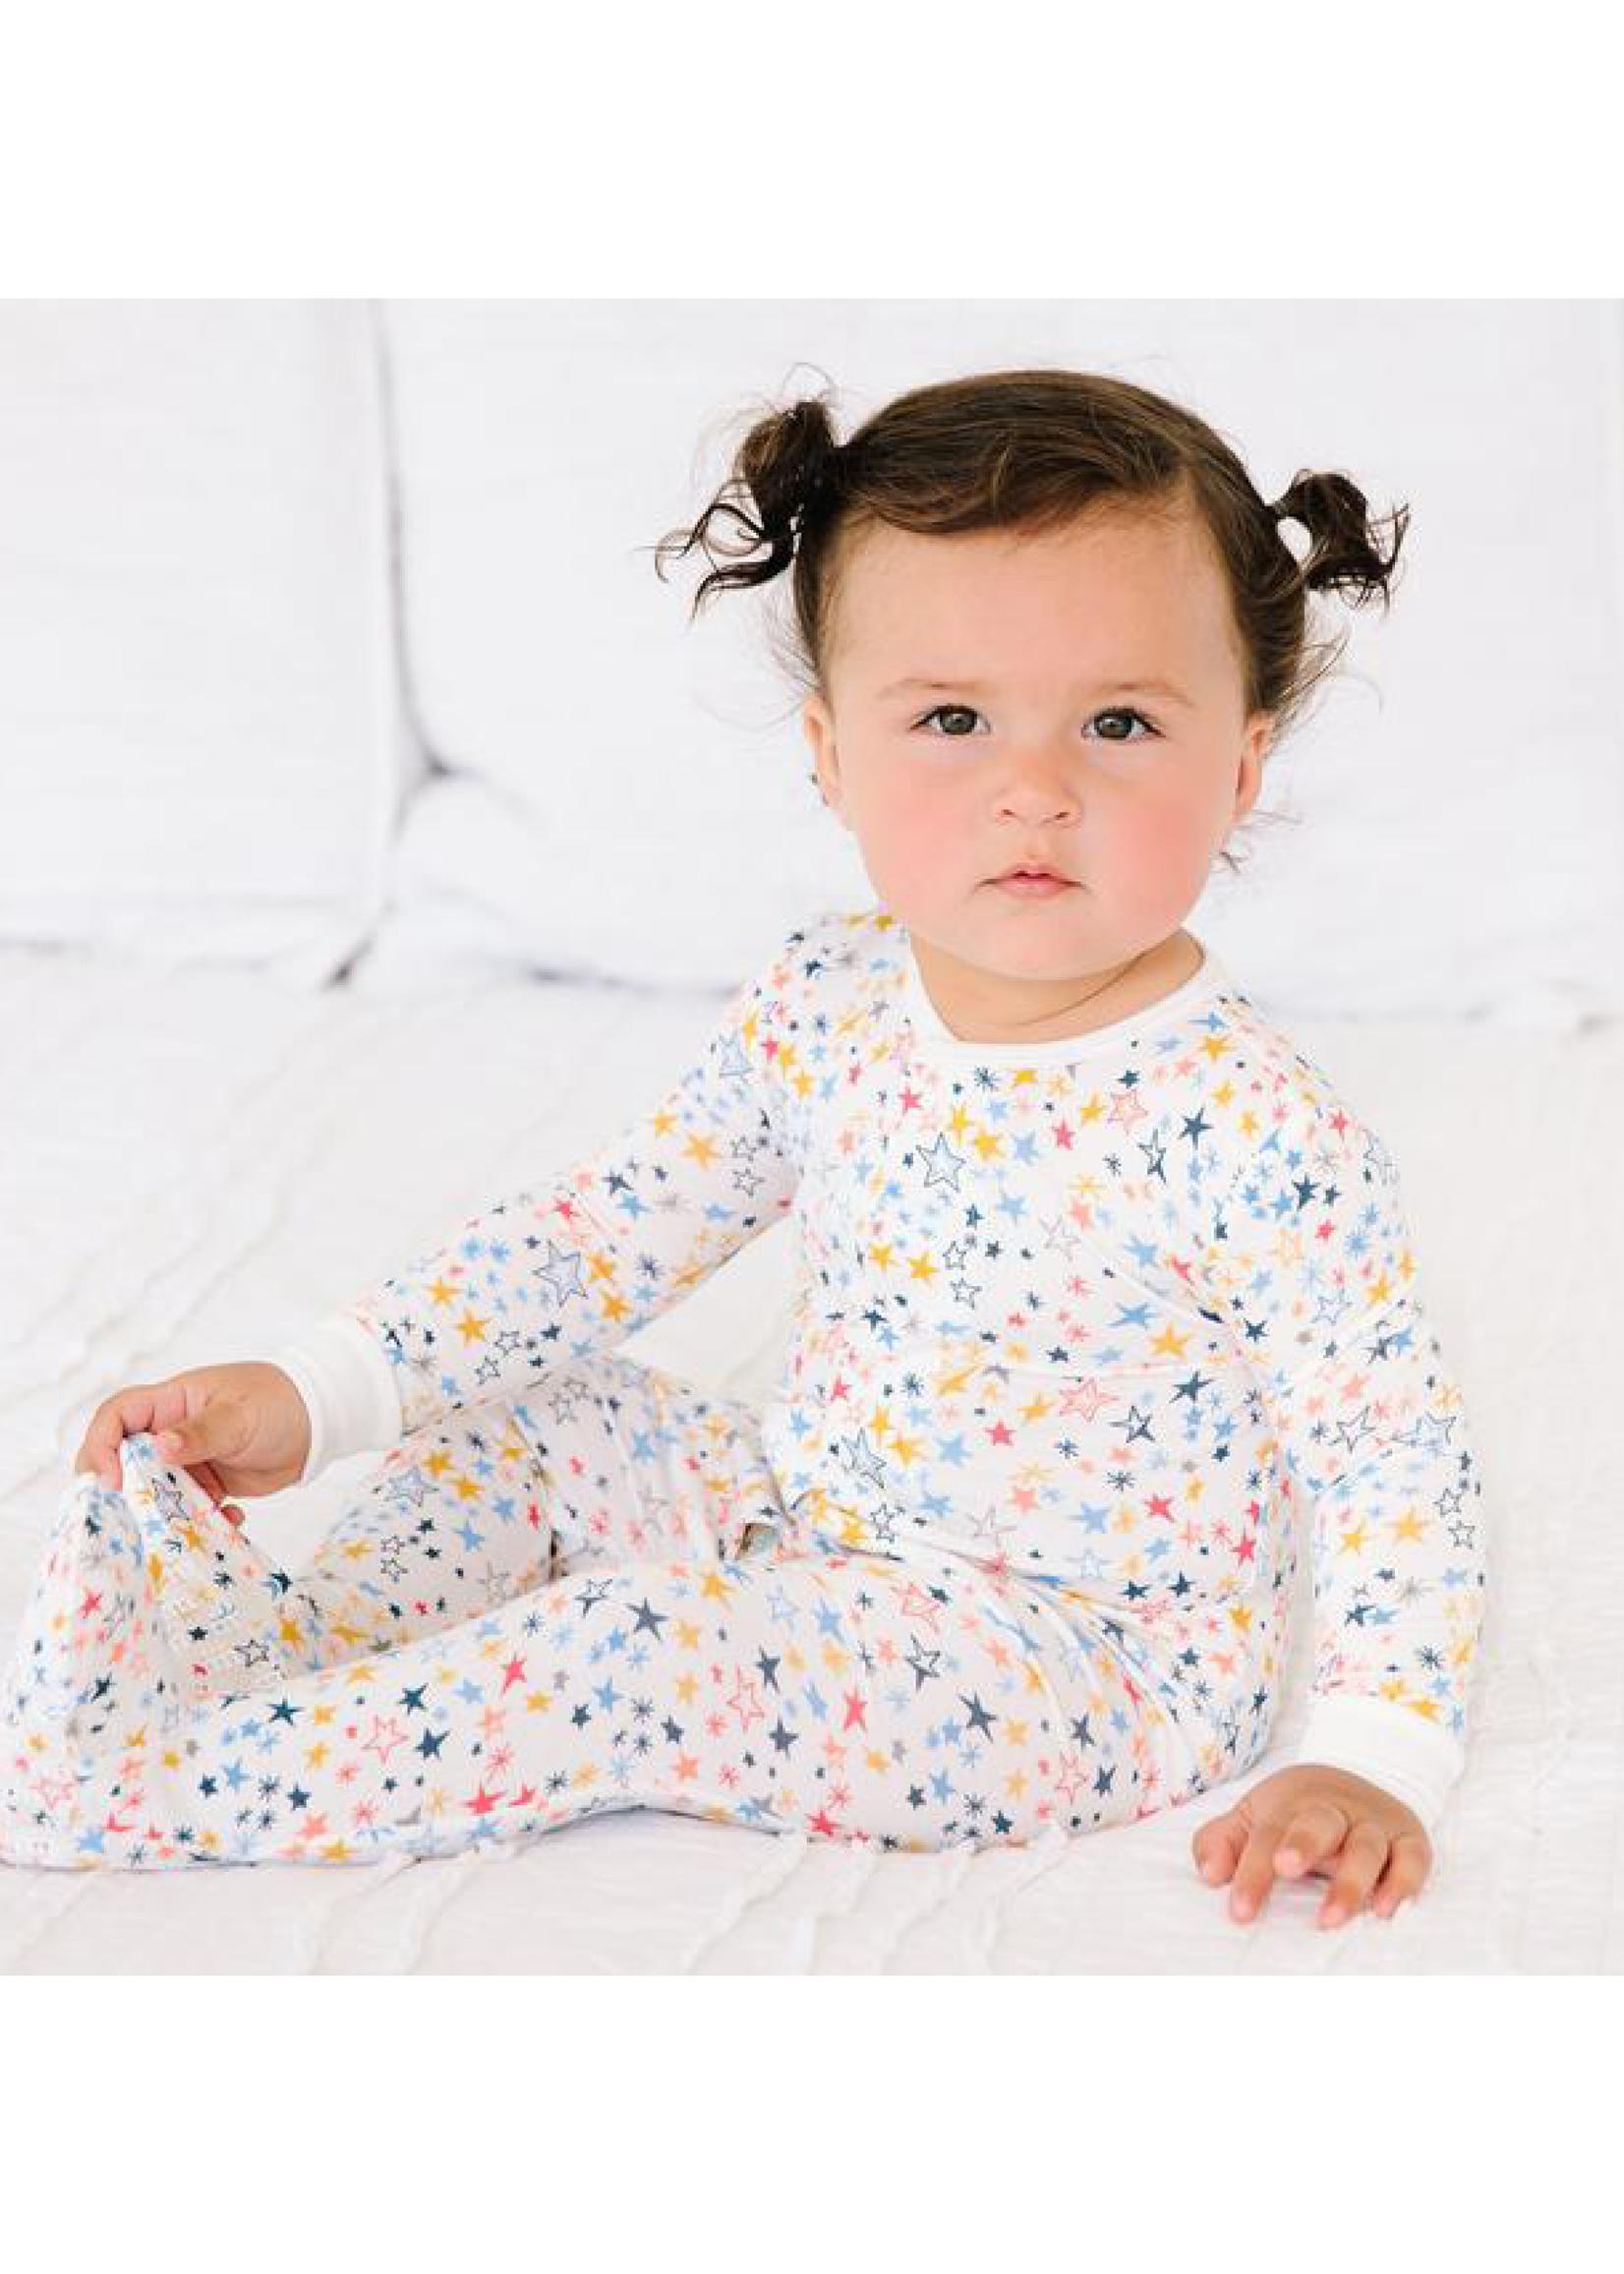 Magnificent Baby Starburst Model Footie